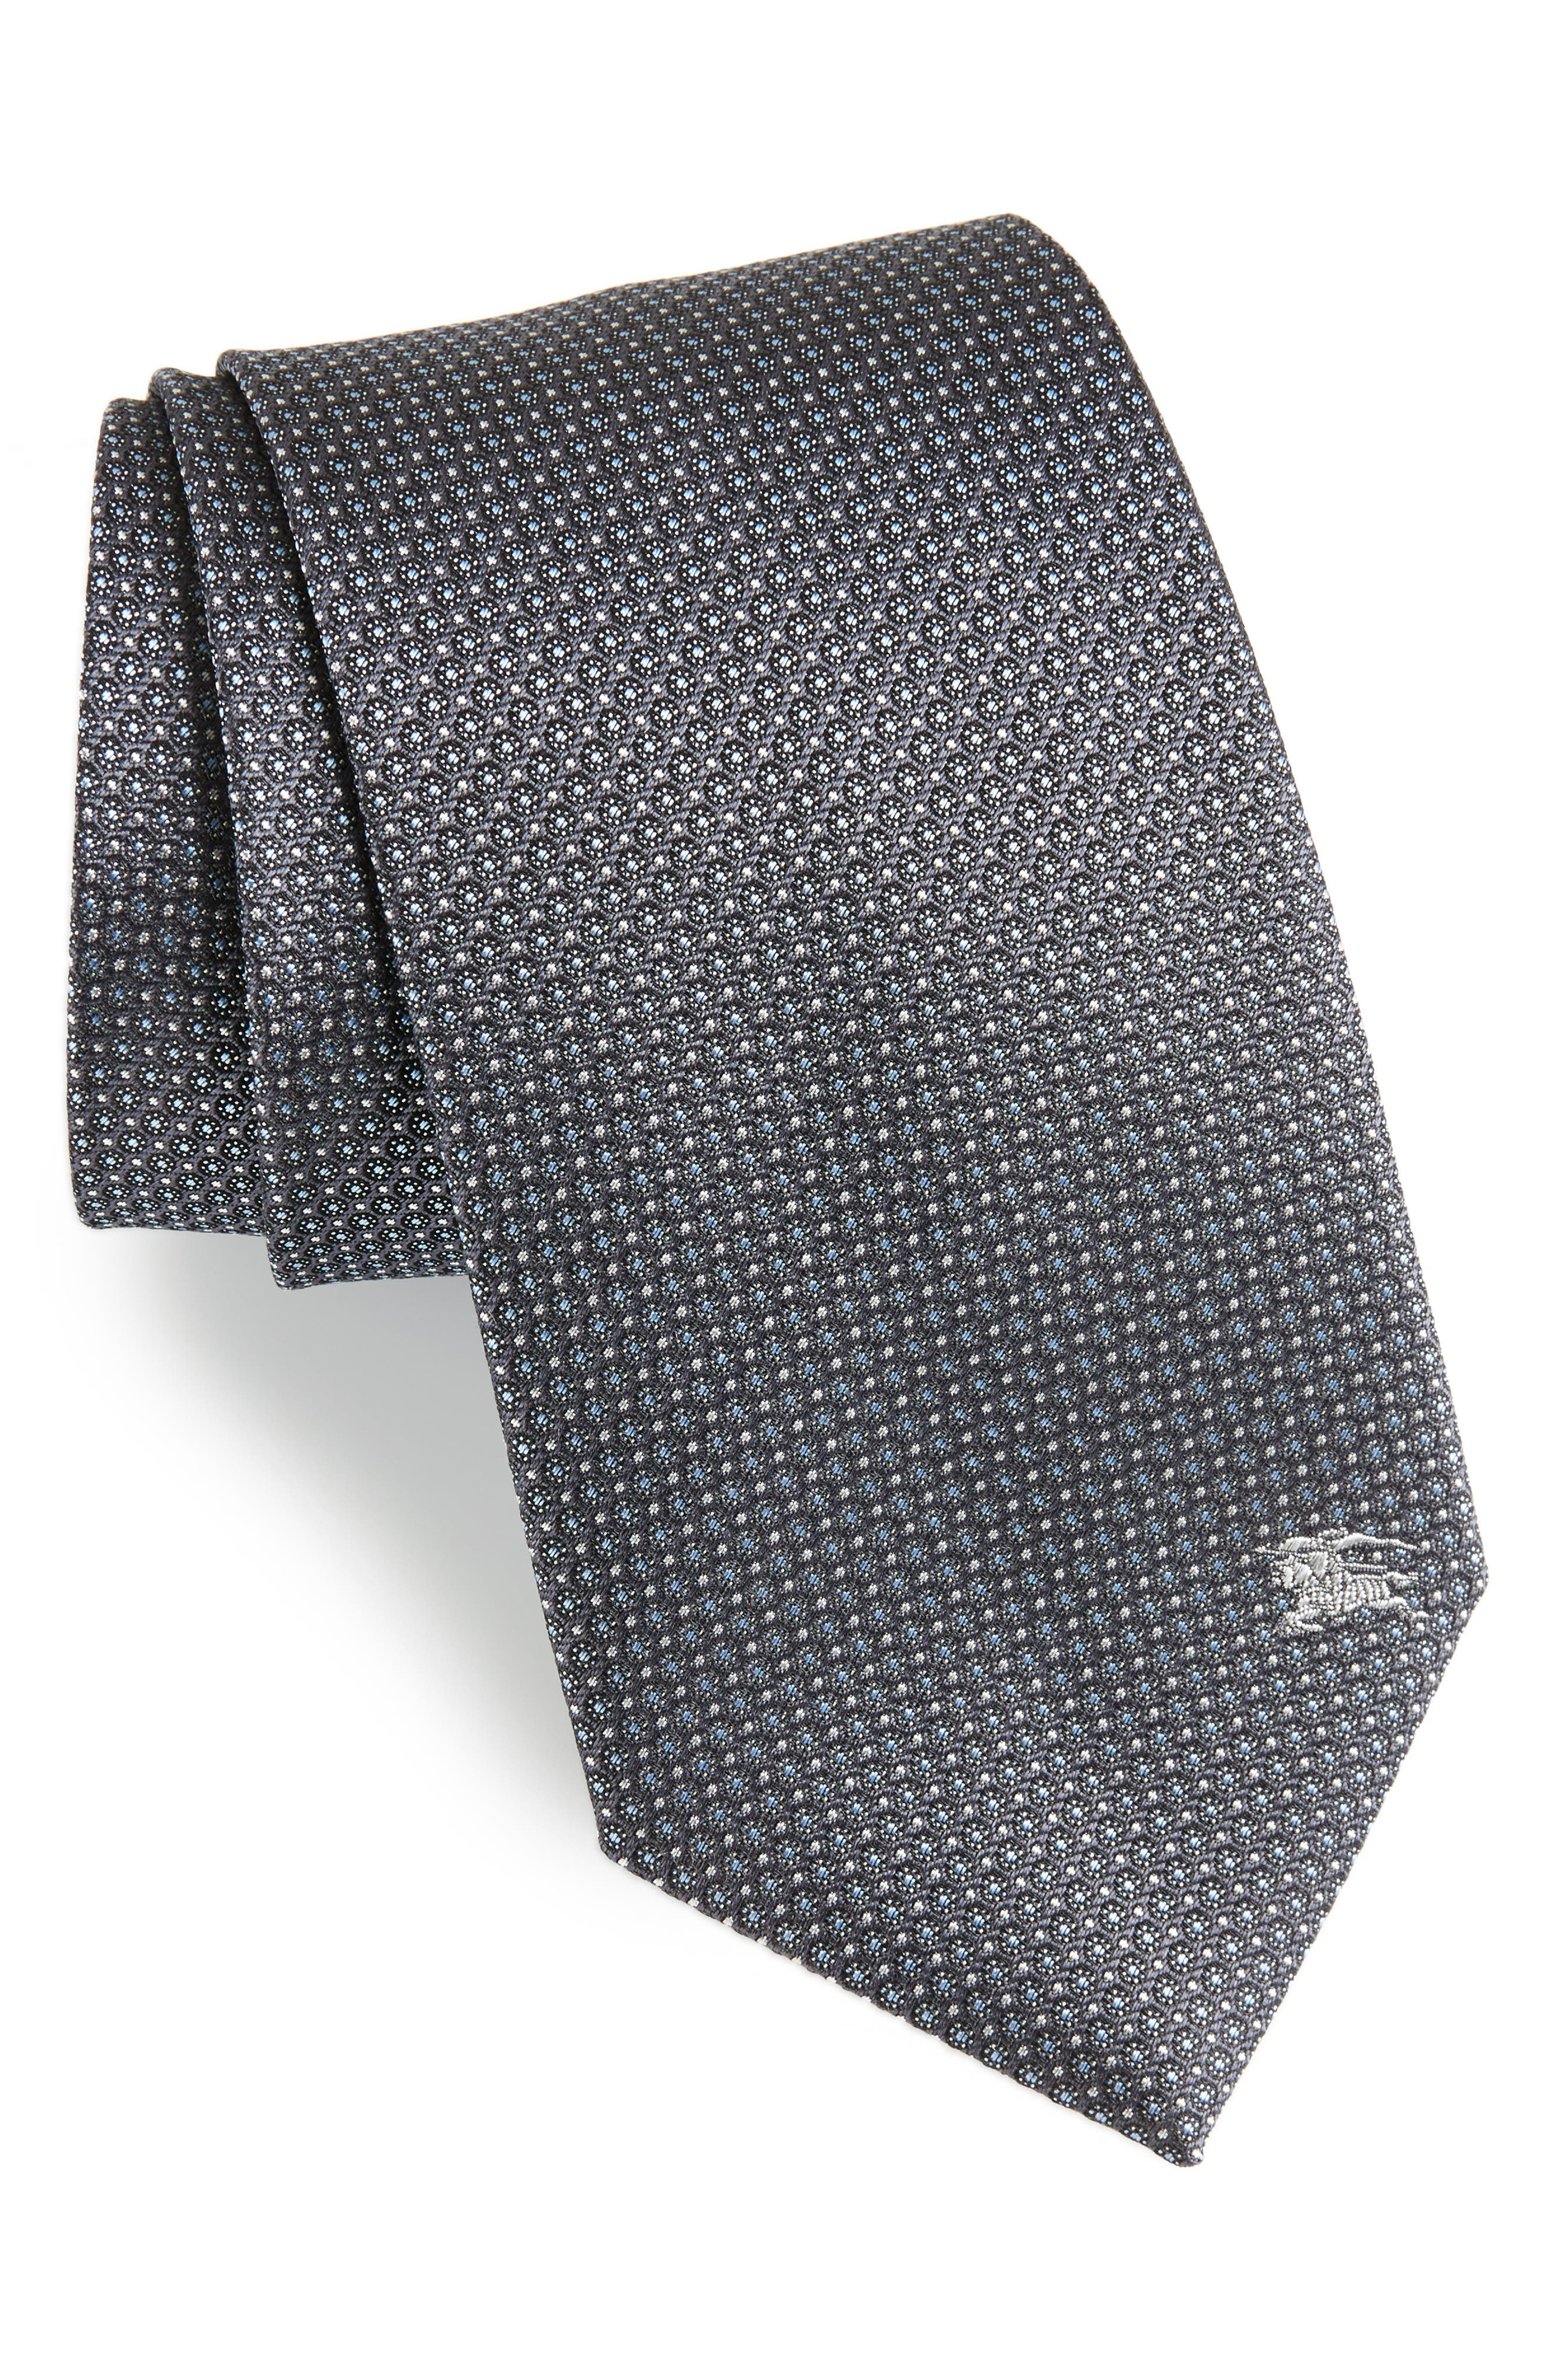 Clinton Silk Tie,                             Main thumbnail 1, color,                             Charcoal